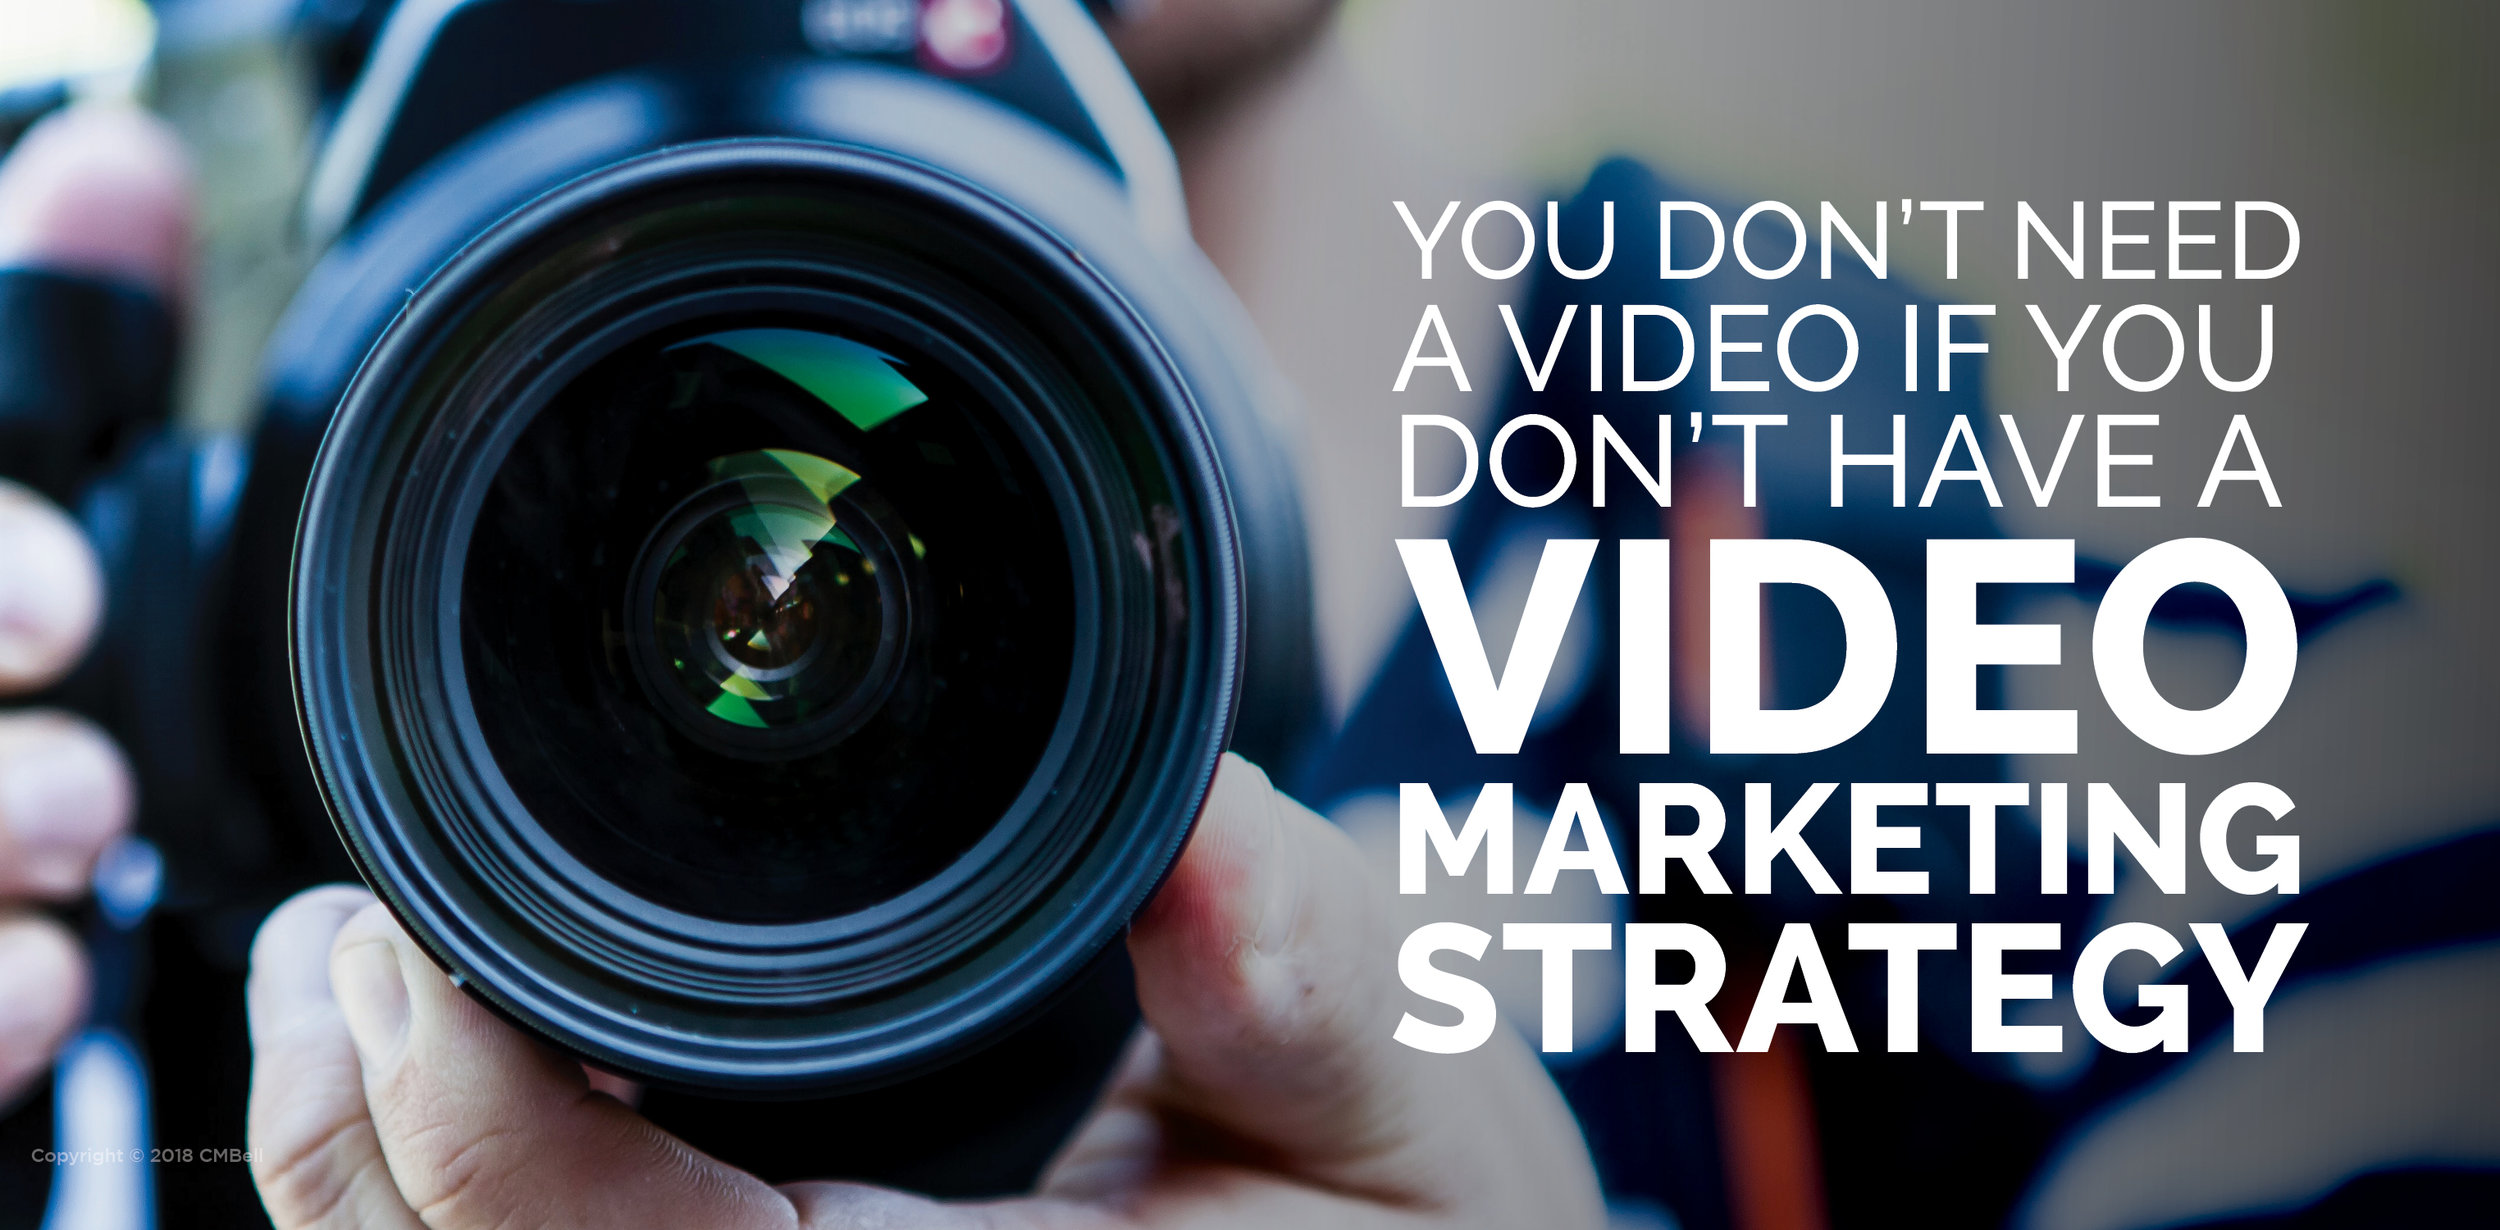 Video marketing.banner. 5-23-18 KA.jpg